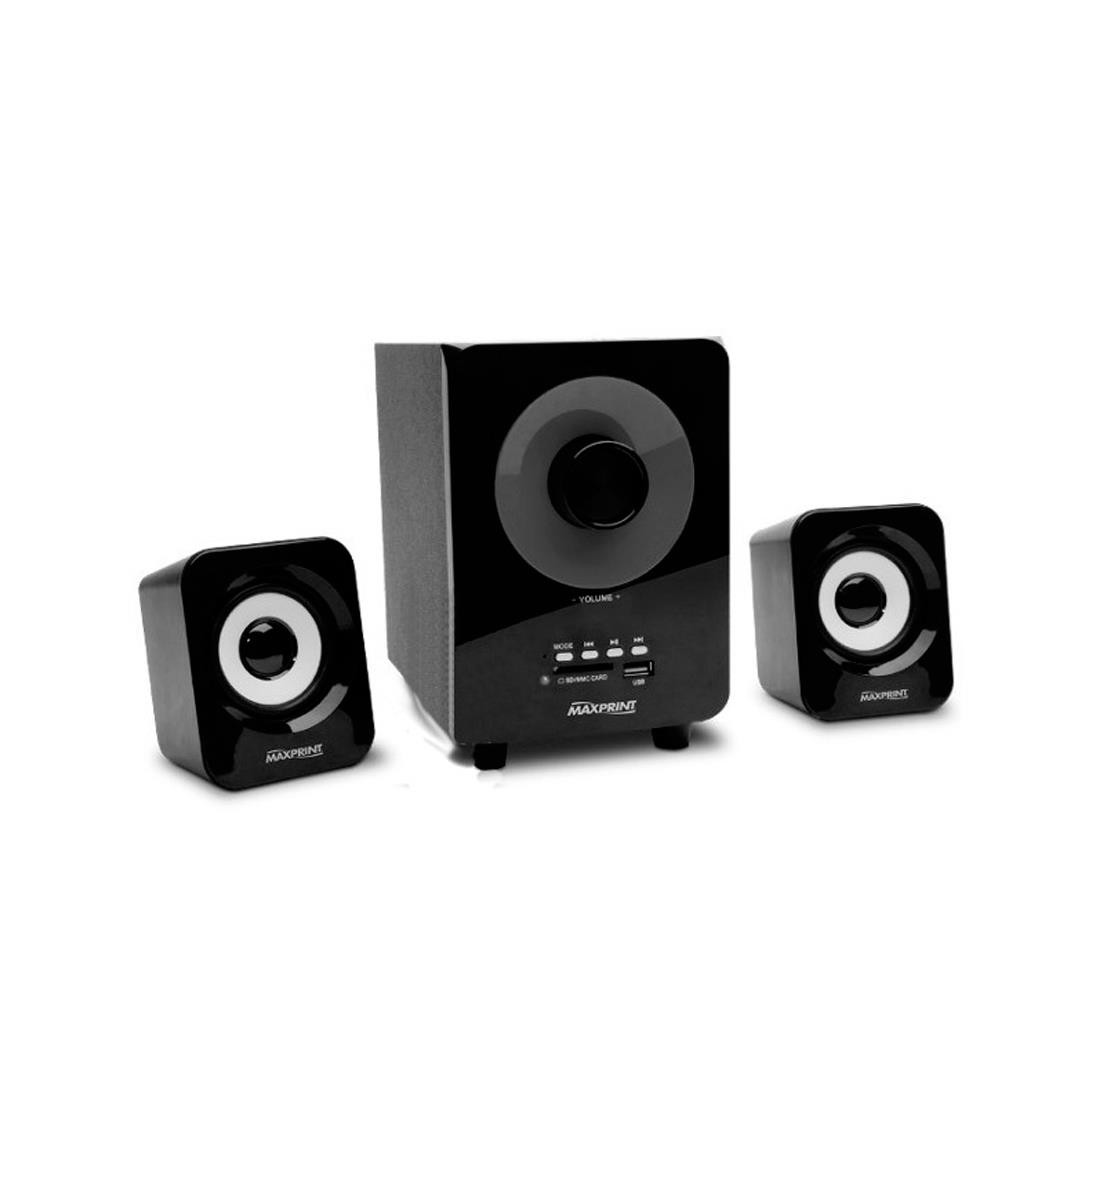 Caixa de Som Maxprint Max Sound Subwoofer 2.1 USB Leitor de Cartao de Memoria 14W RMS